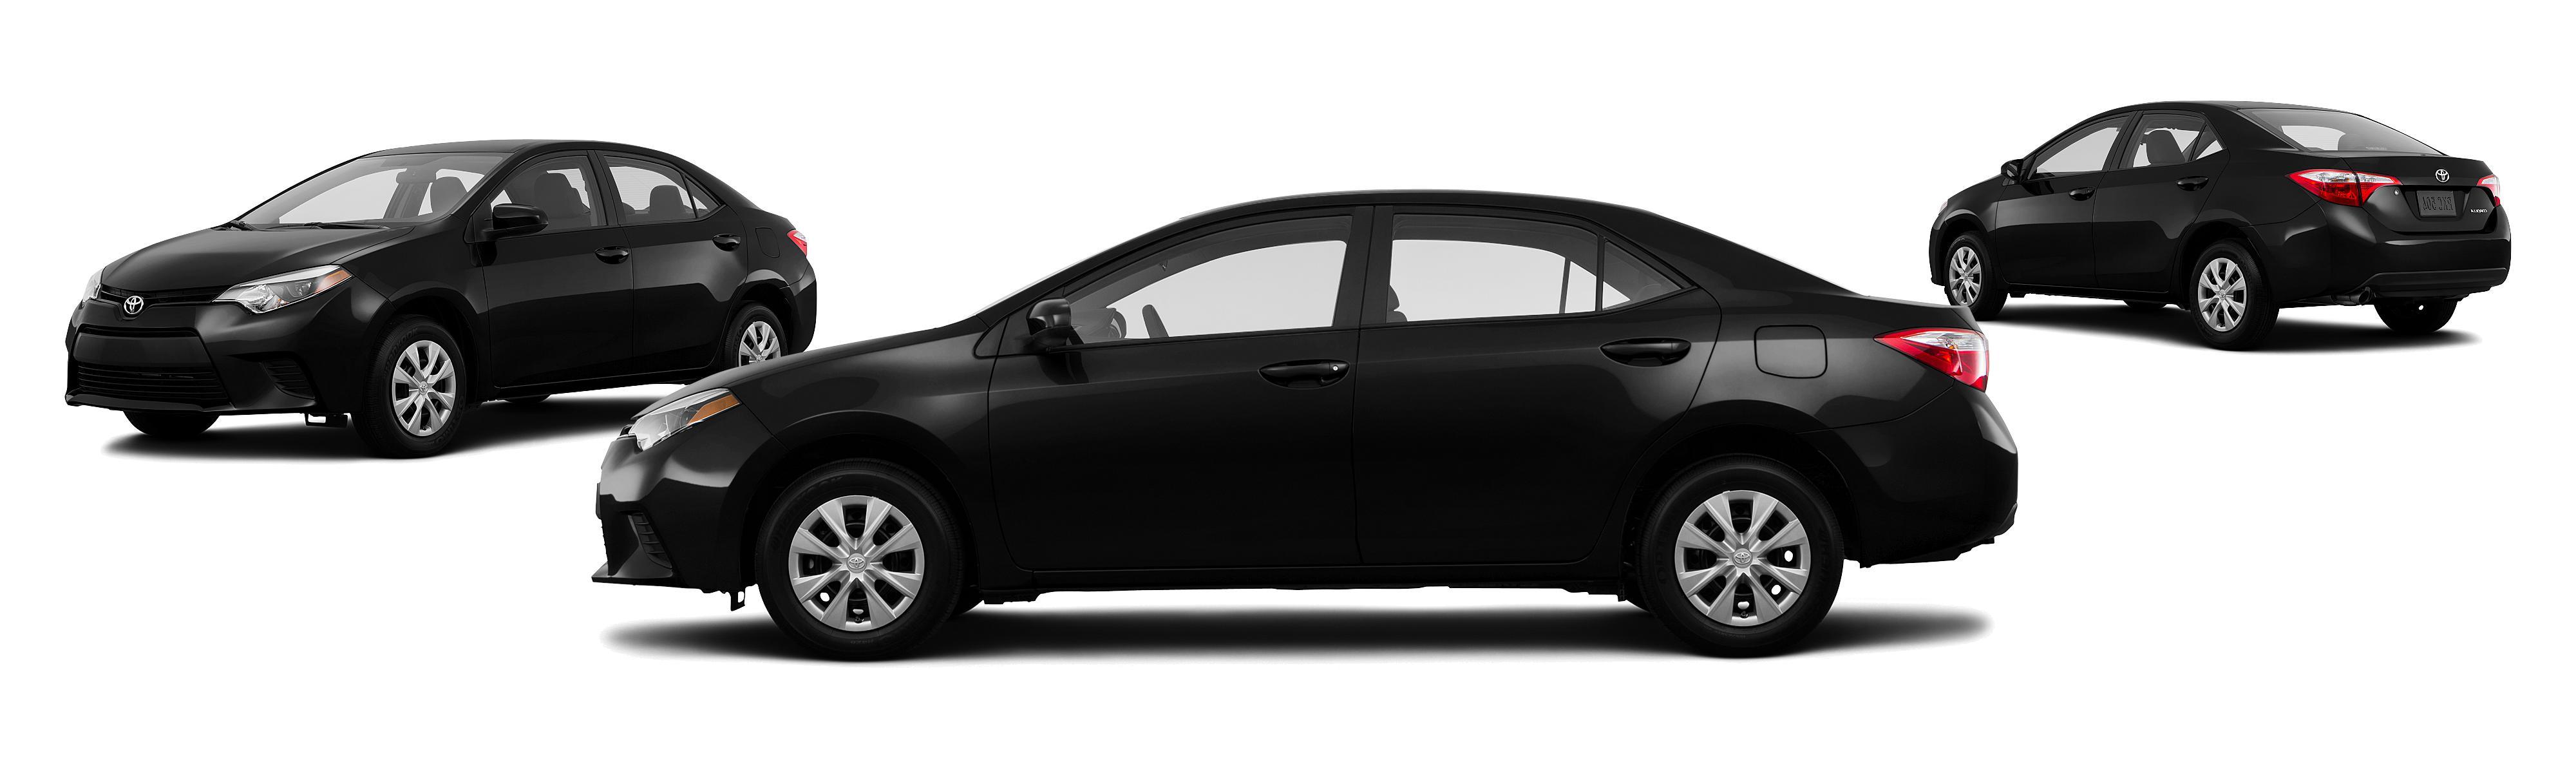 kingston door corolla sedan s inventory vehicle en new cvti sale toyota more for le details in l